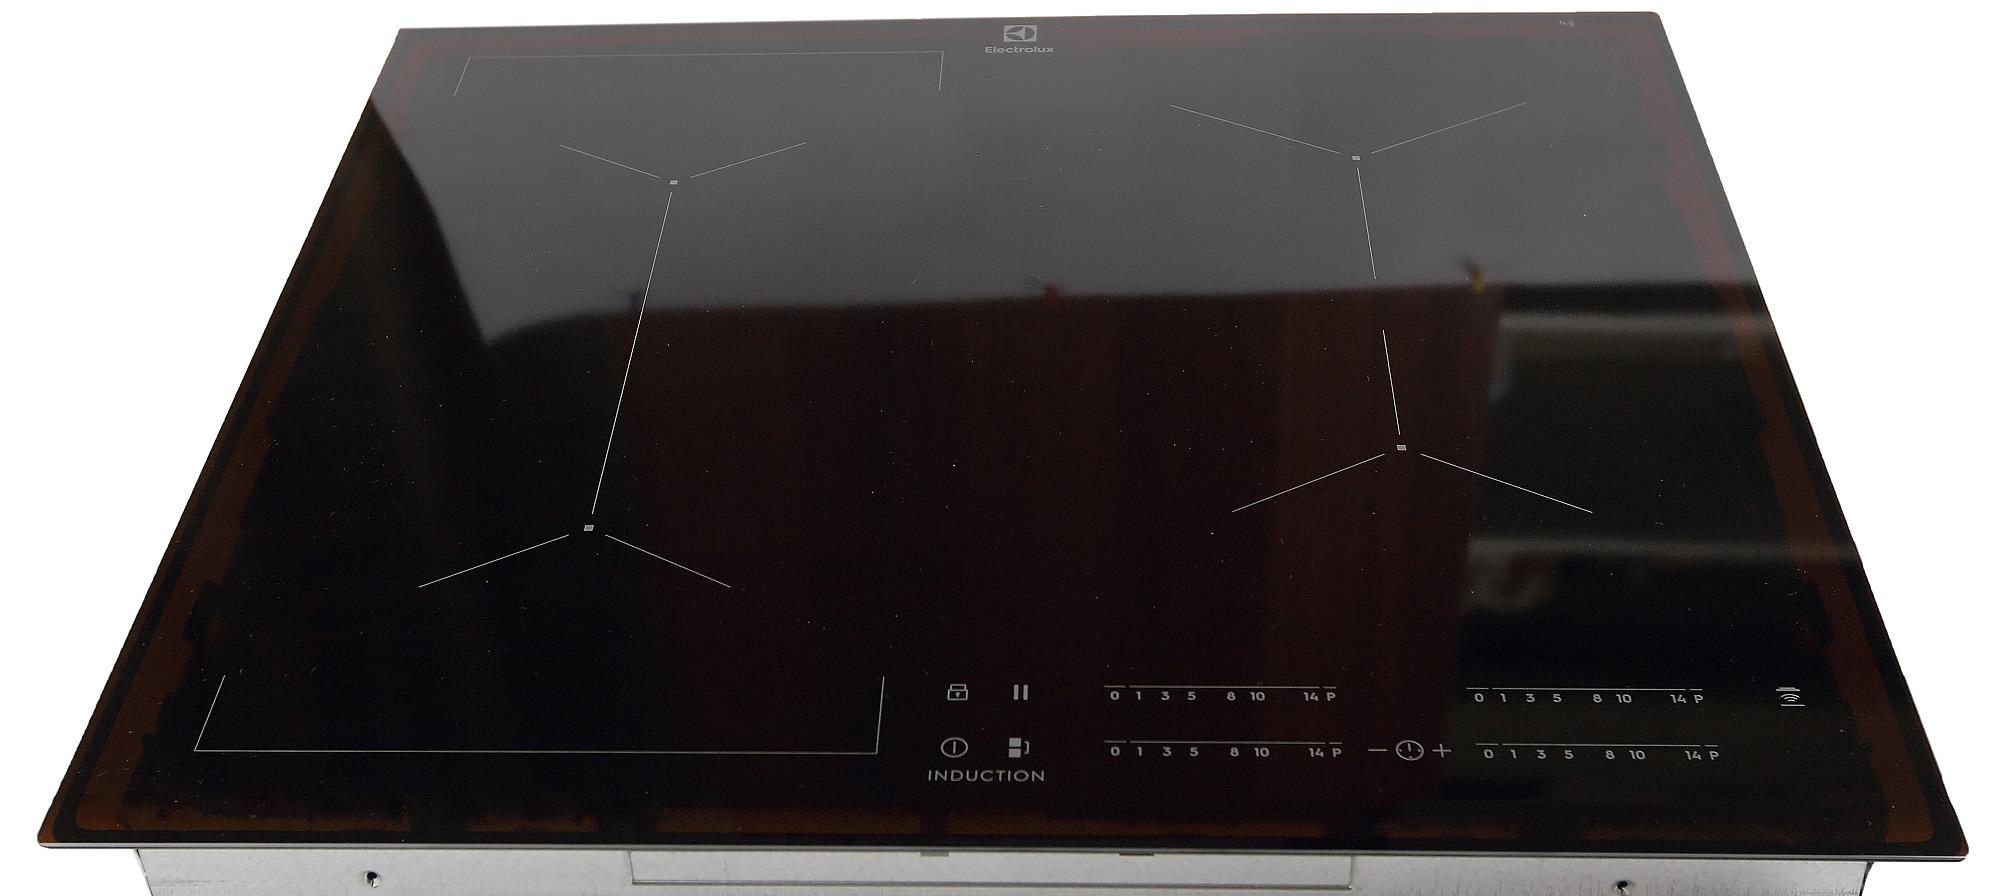 Electrolux IPE 6453 KF